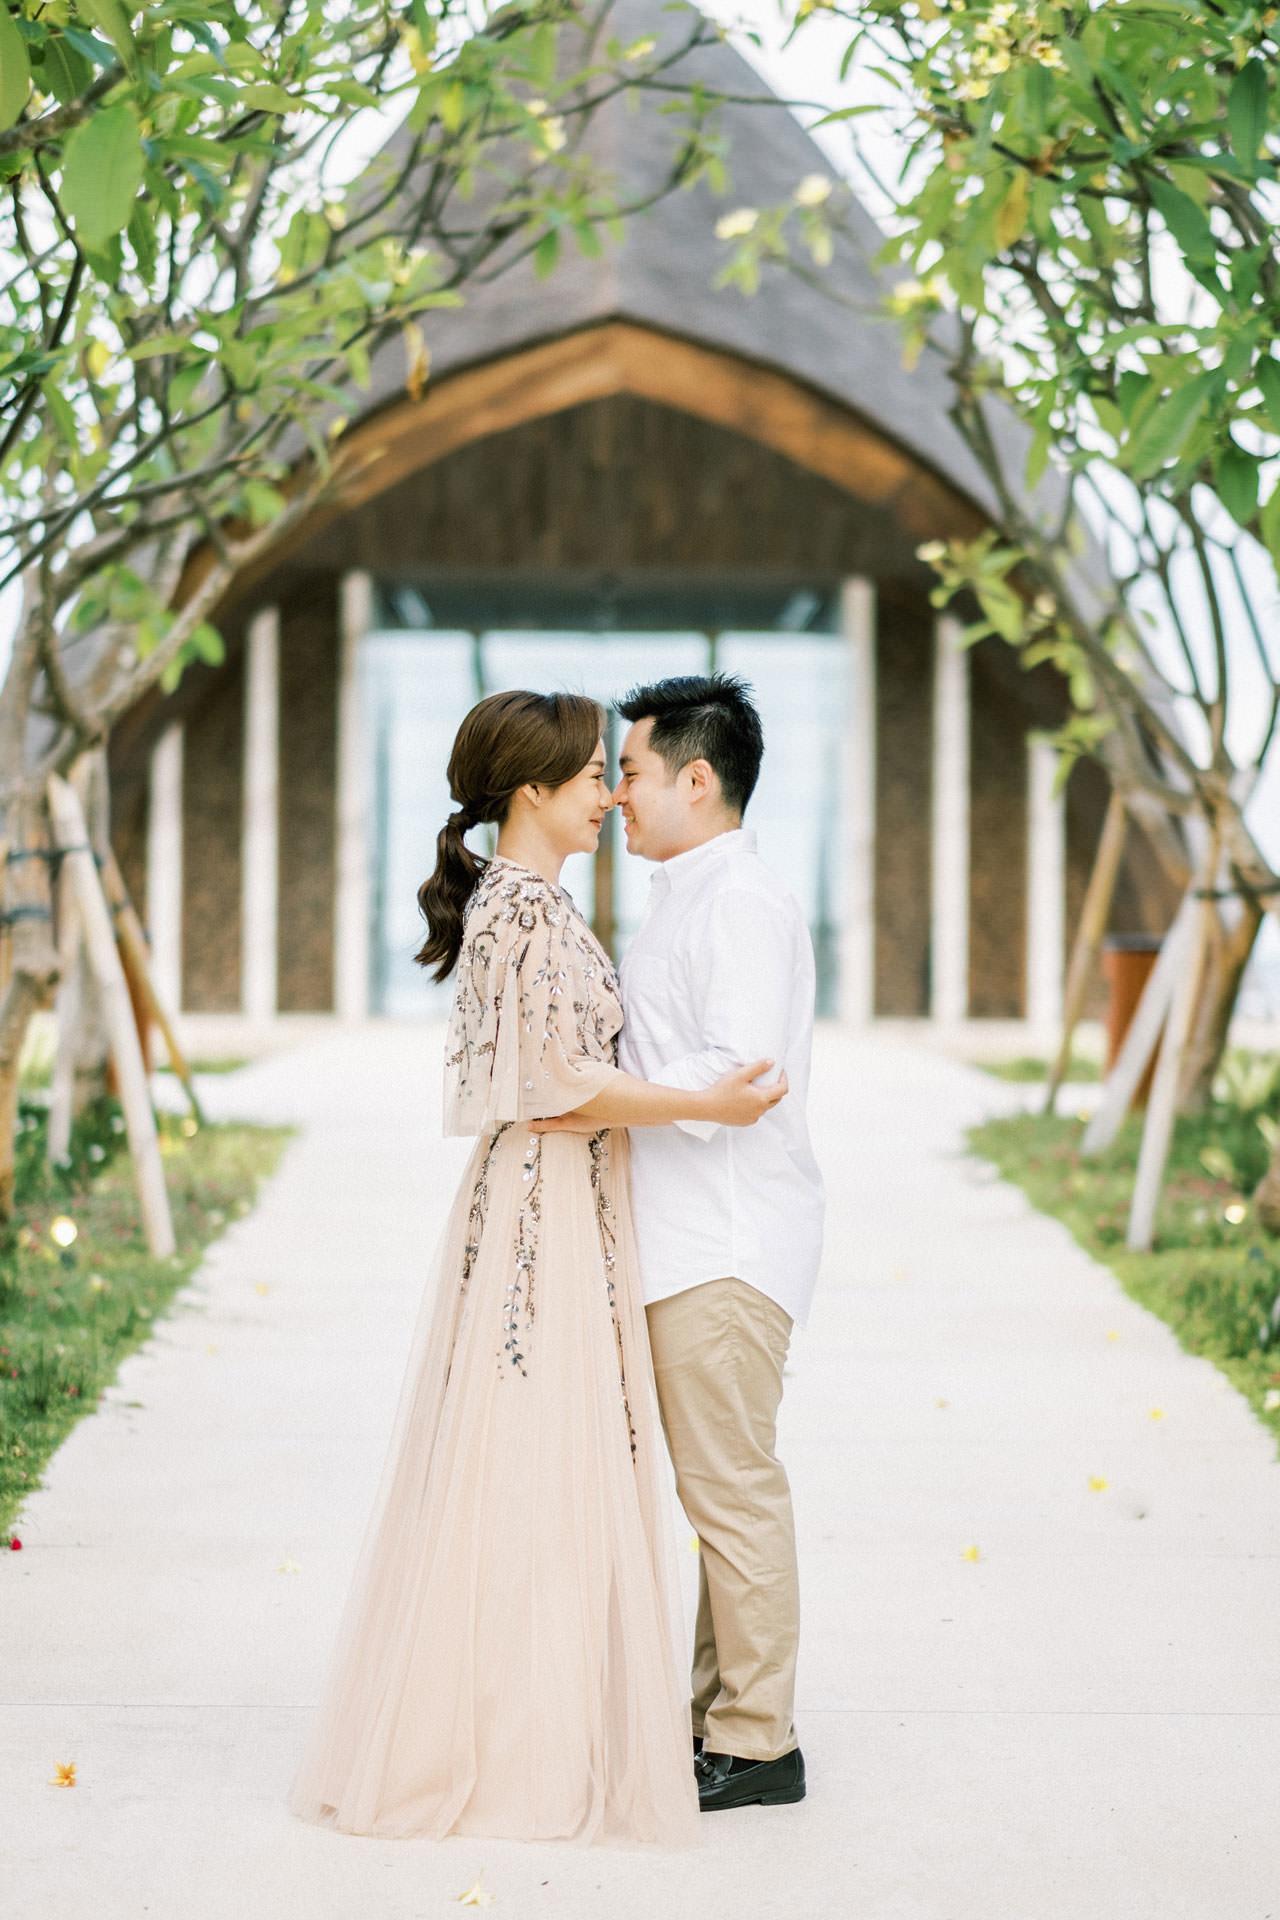 Apurva Kempinski Bali Proposal Photography 13